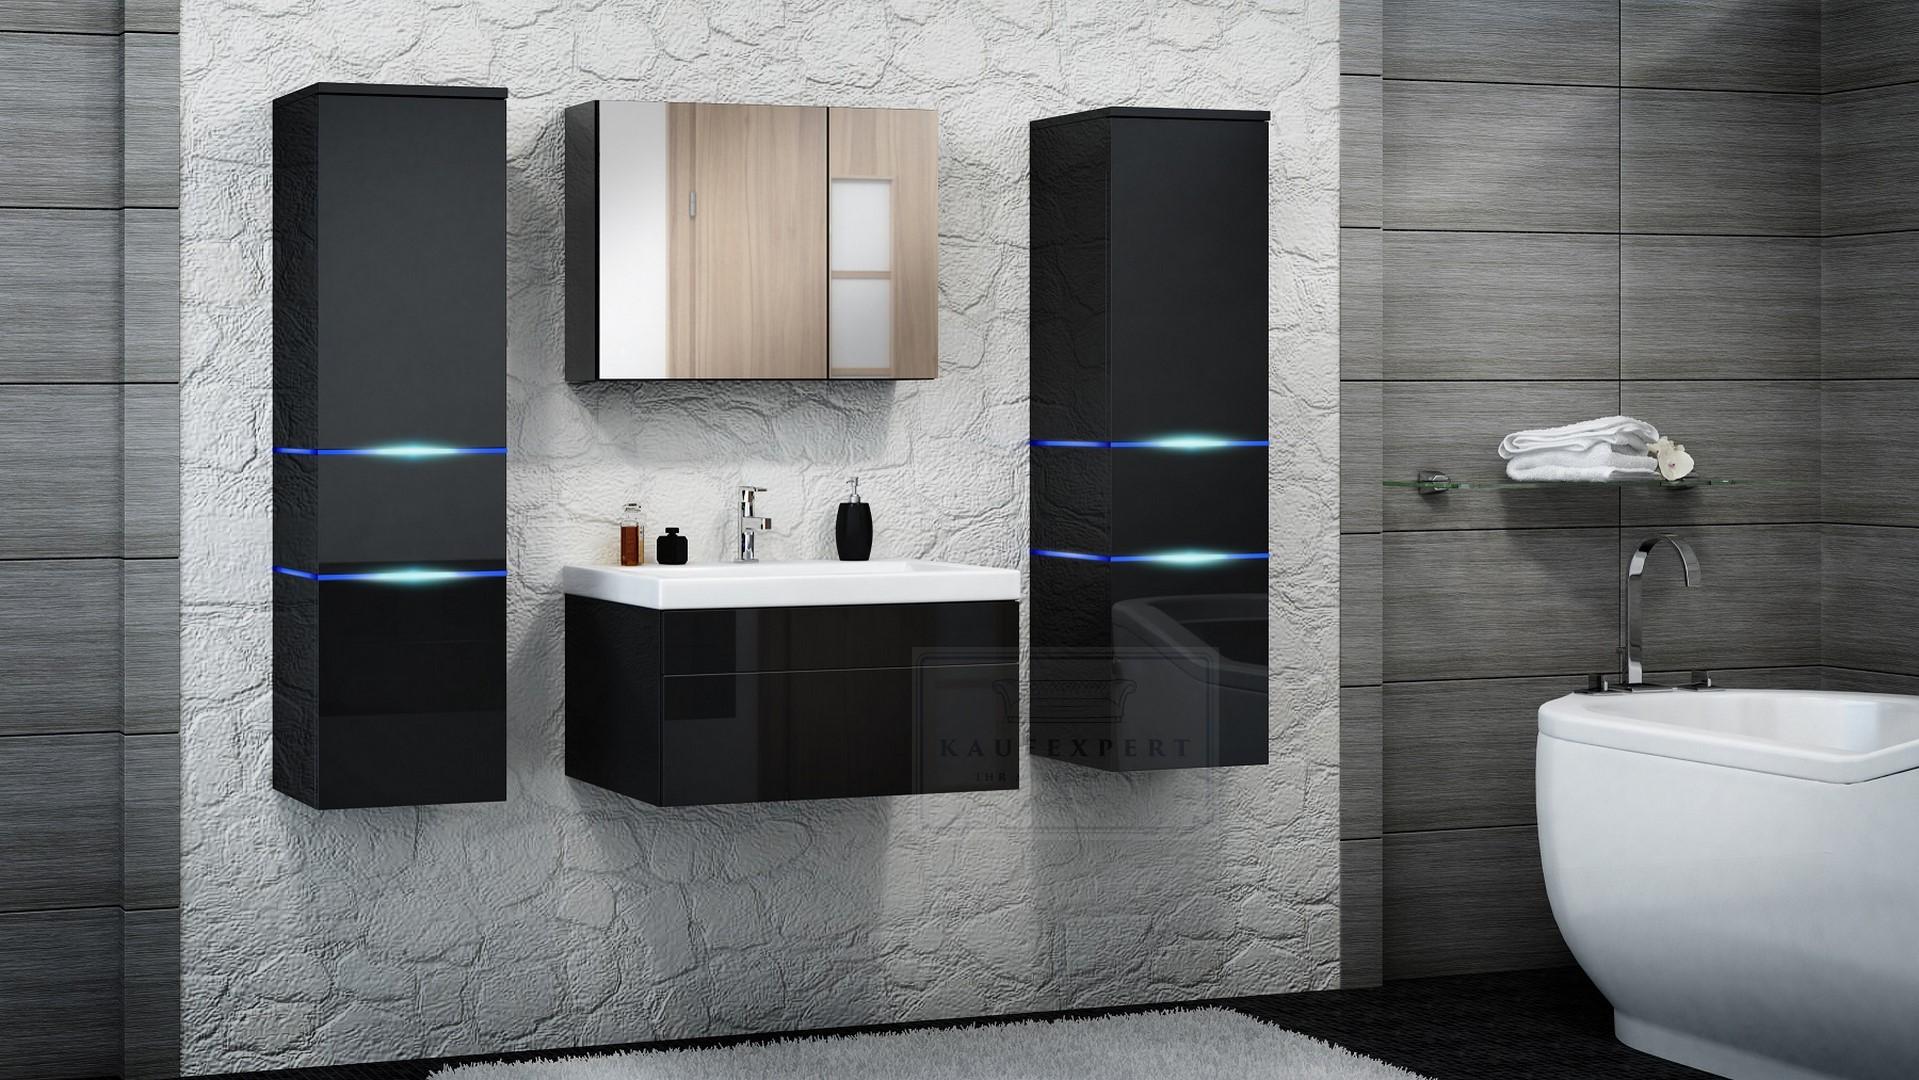 kaufexpert badm bel set prestige schwarz hochglanz lackiert keramik waschbecken badezimmer led. Black Bedroom Furniture Sets. Home Design Ideas